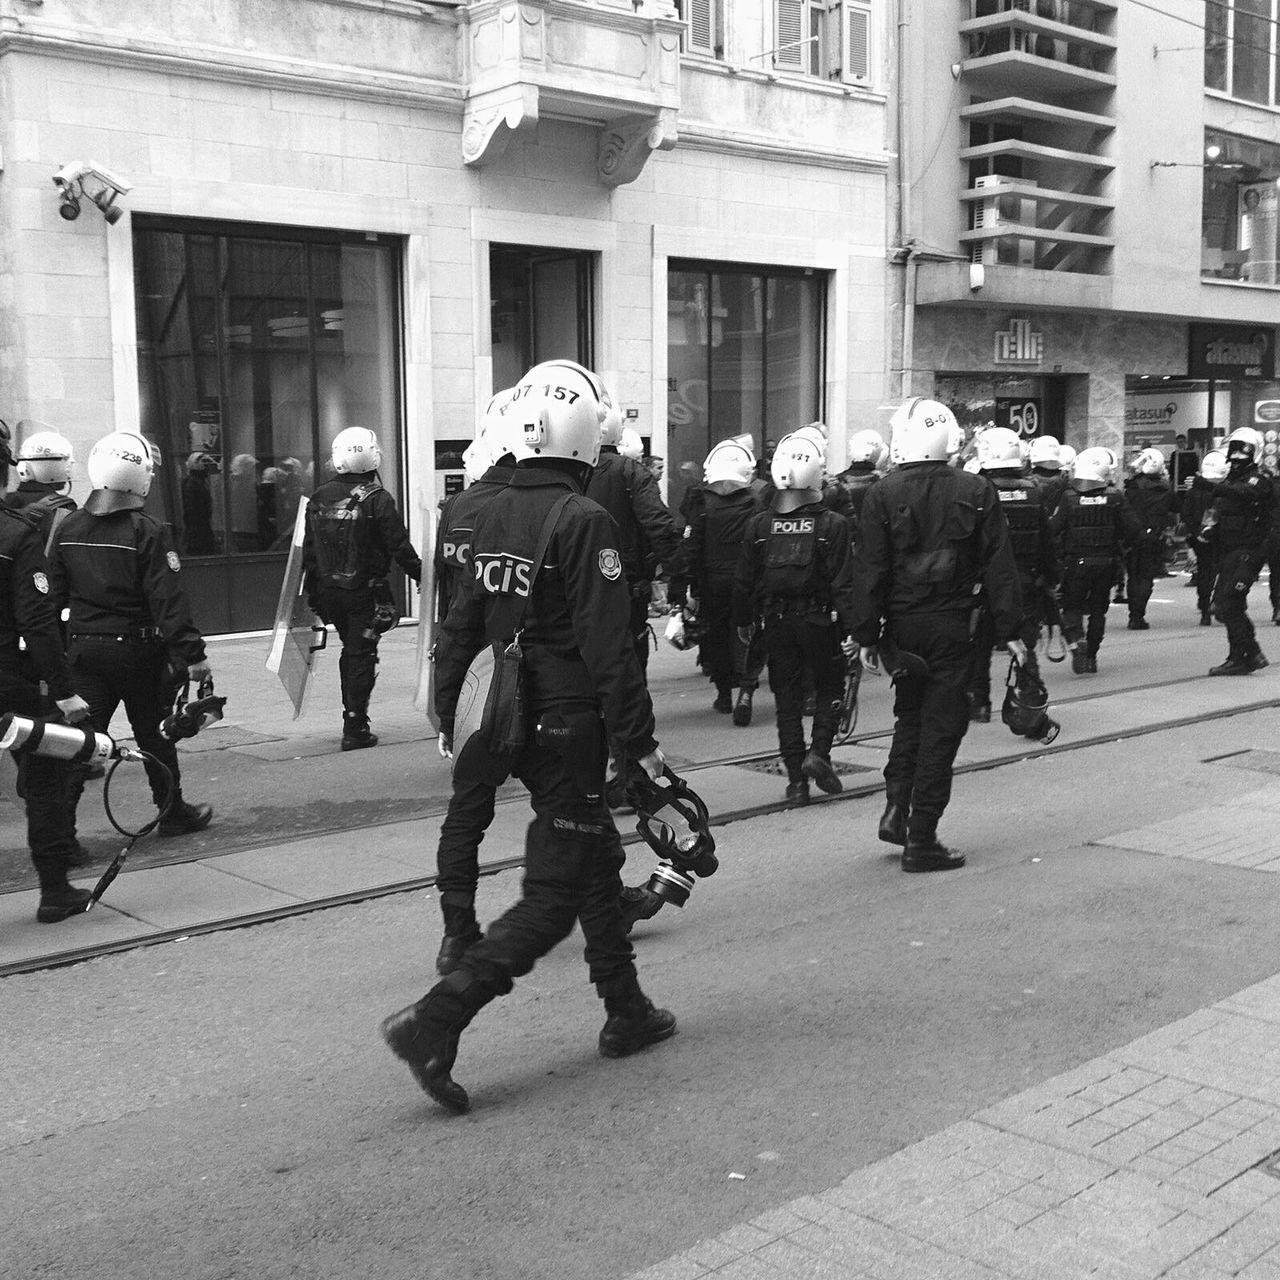 Police News Demonstration Istanbul Istanbul Turkey Turkey Taksim Riot Newspaper Men